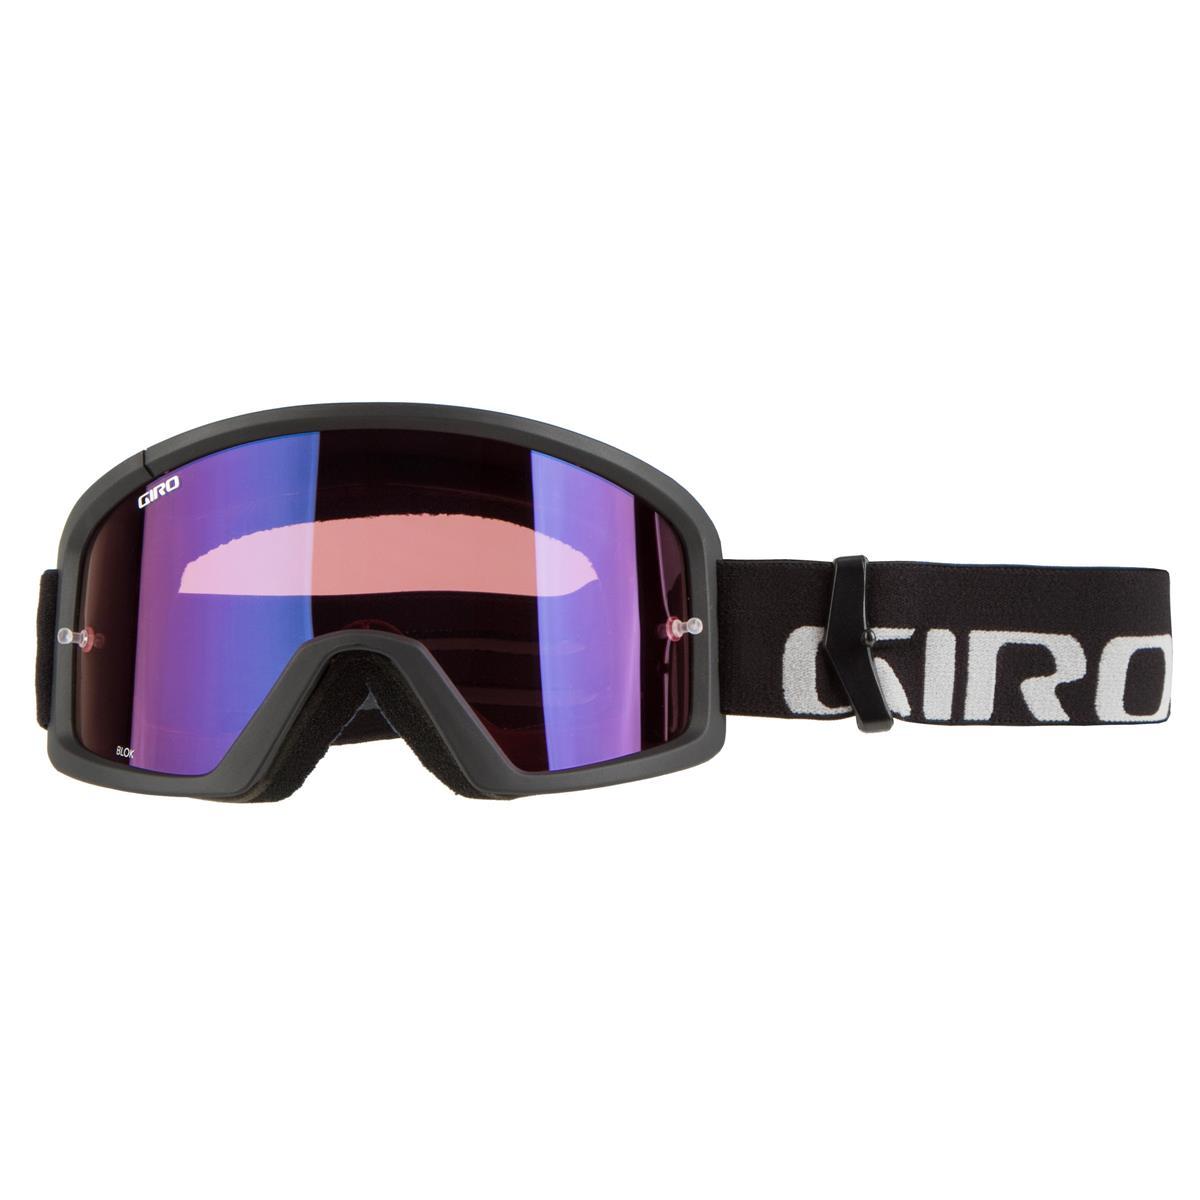 Giro Crossbrille Blok Schwarz/Grau - Vivid Trail Klar Anti-Fog